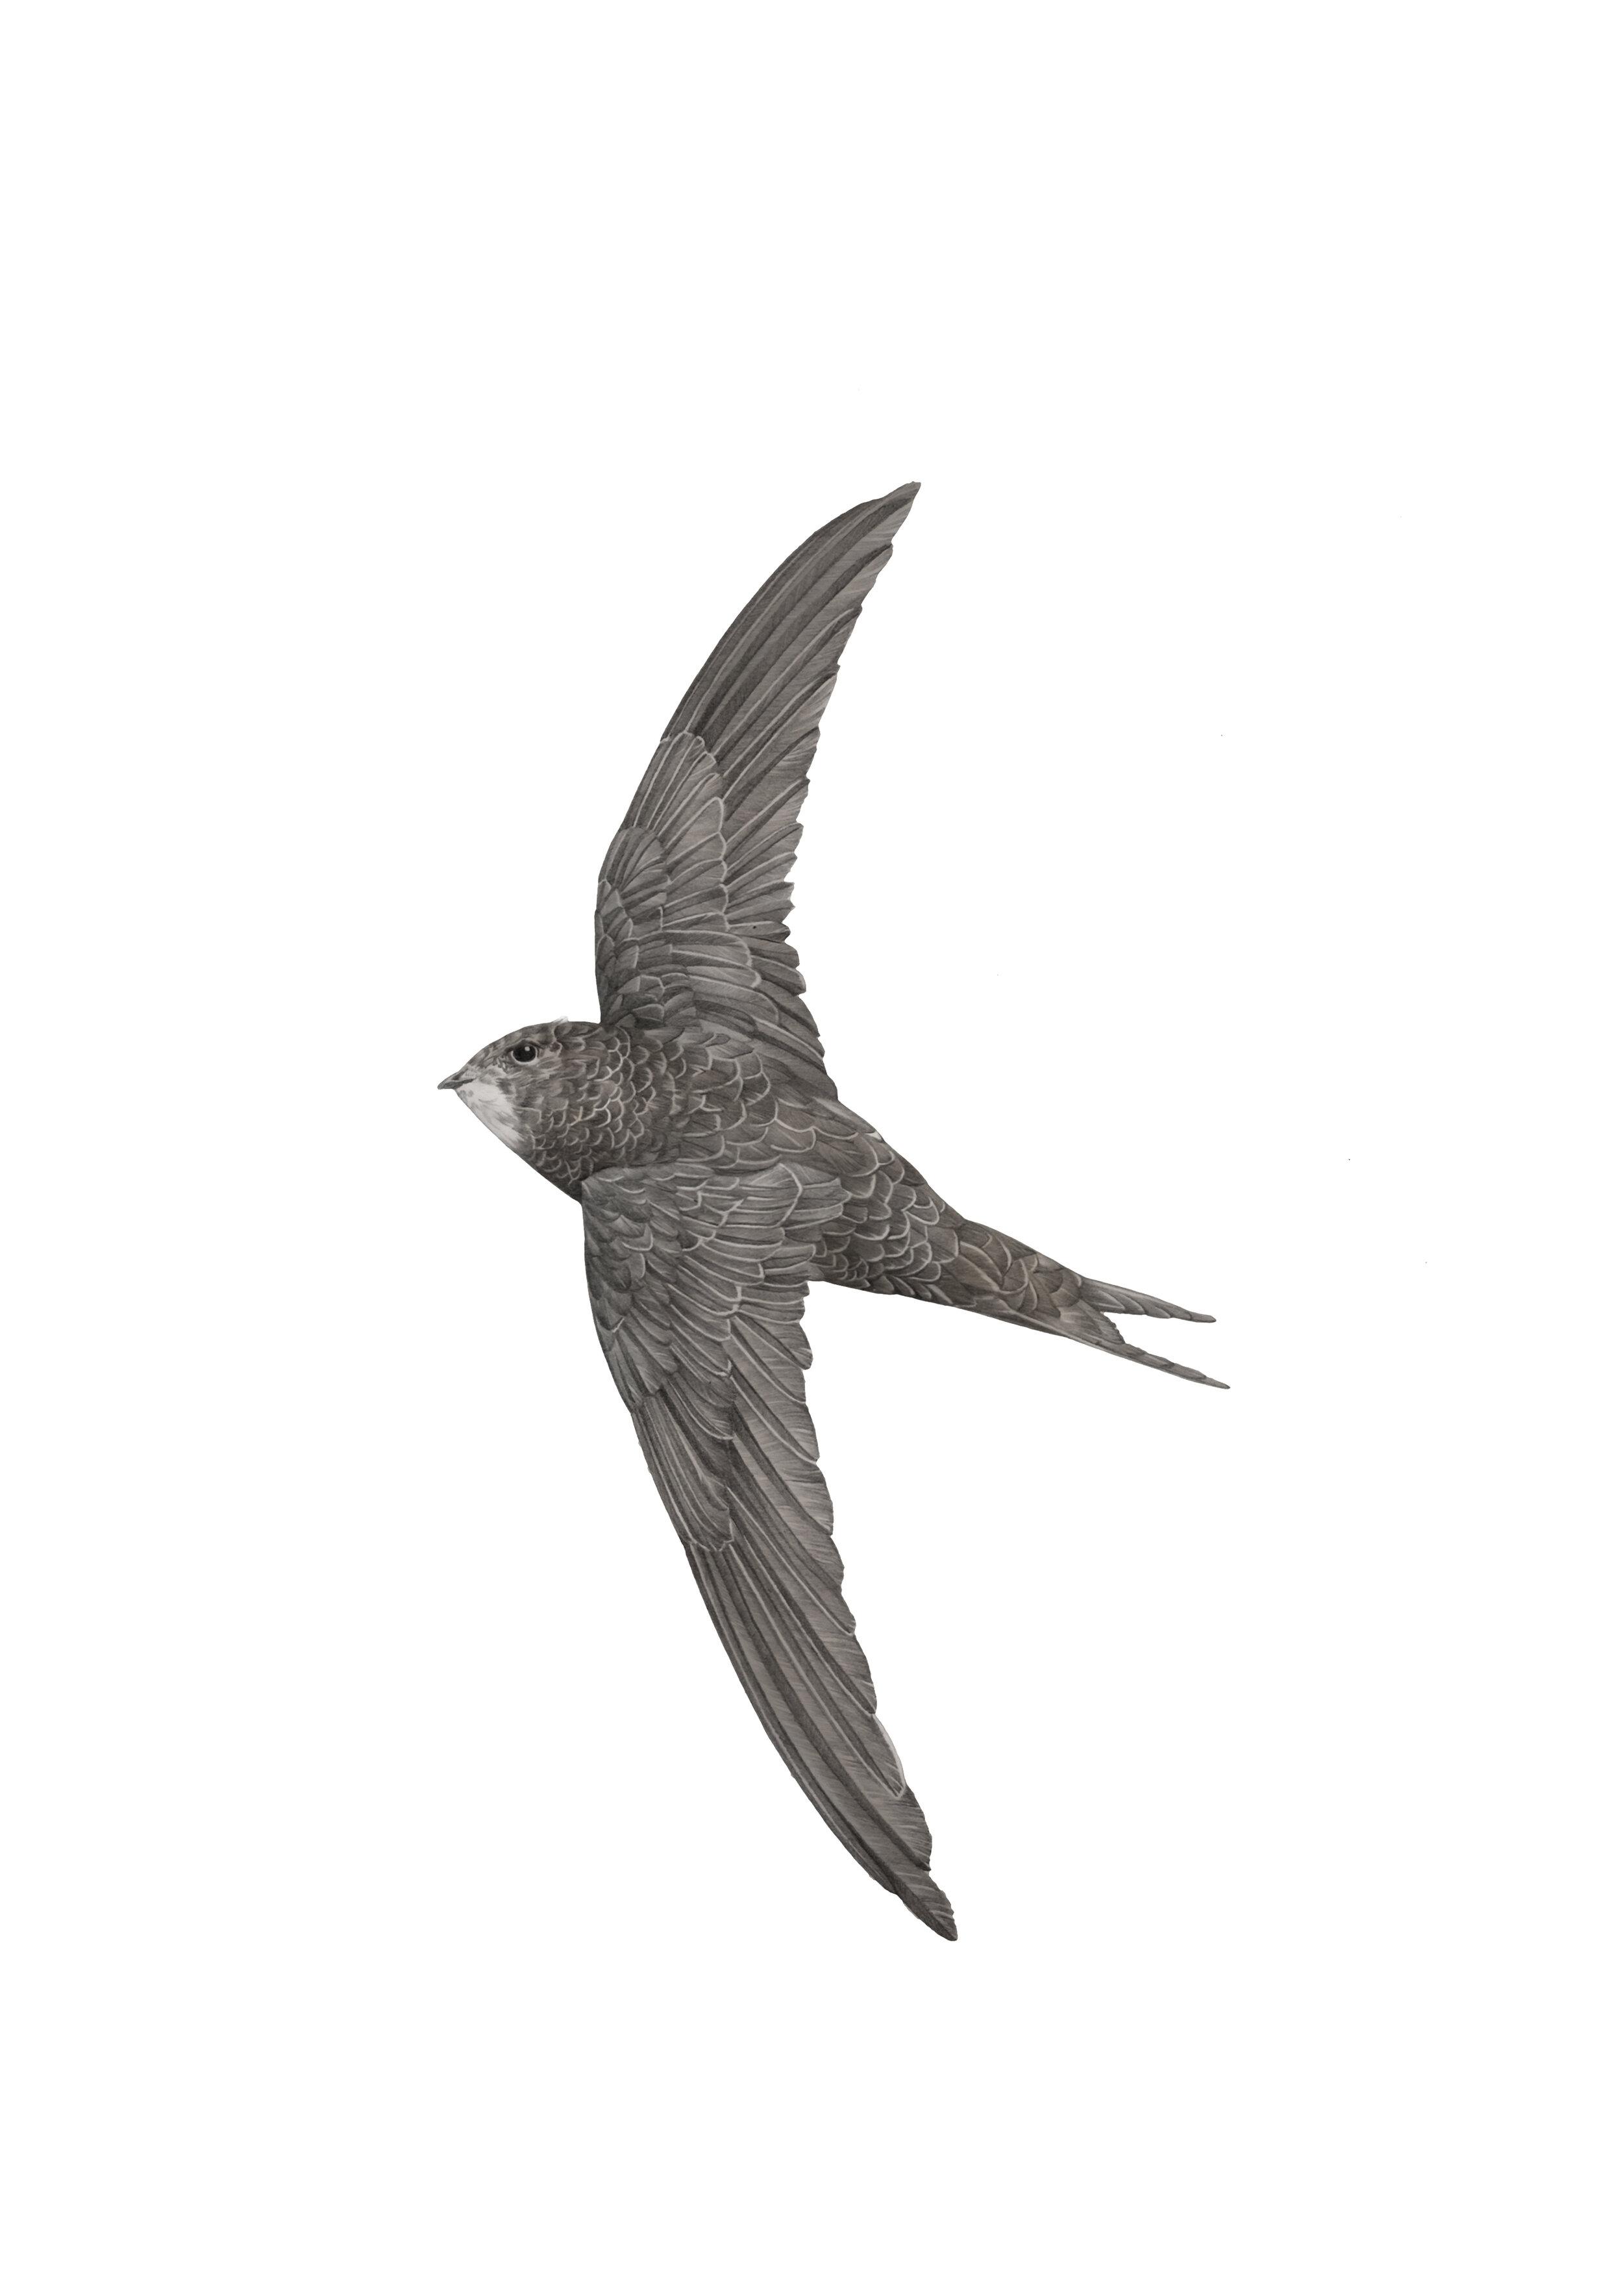 common swift A4 RGB.jpg